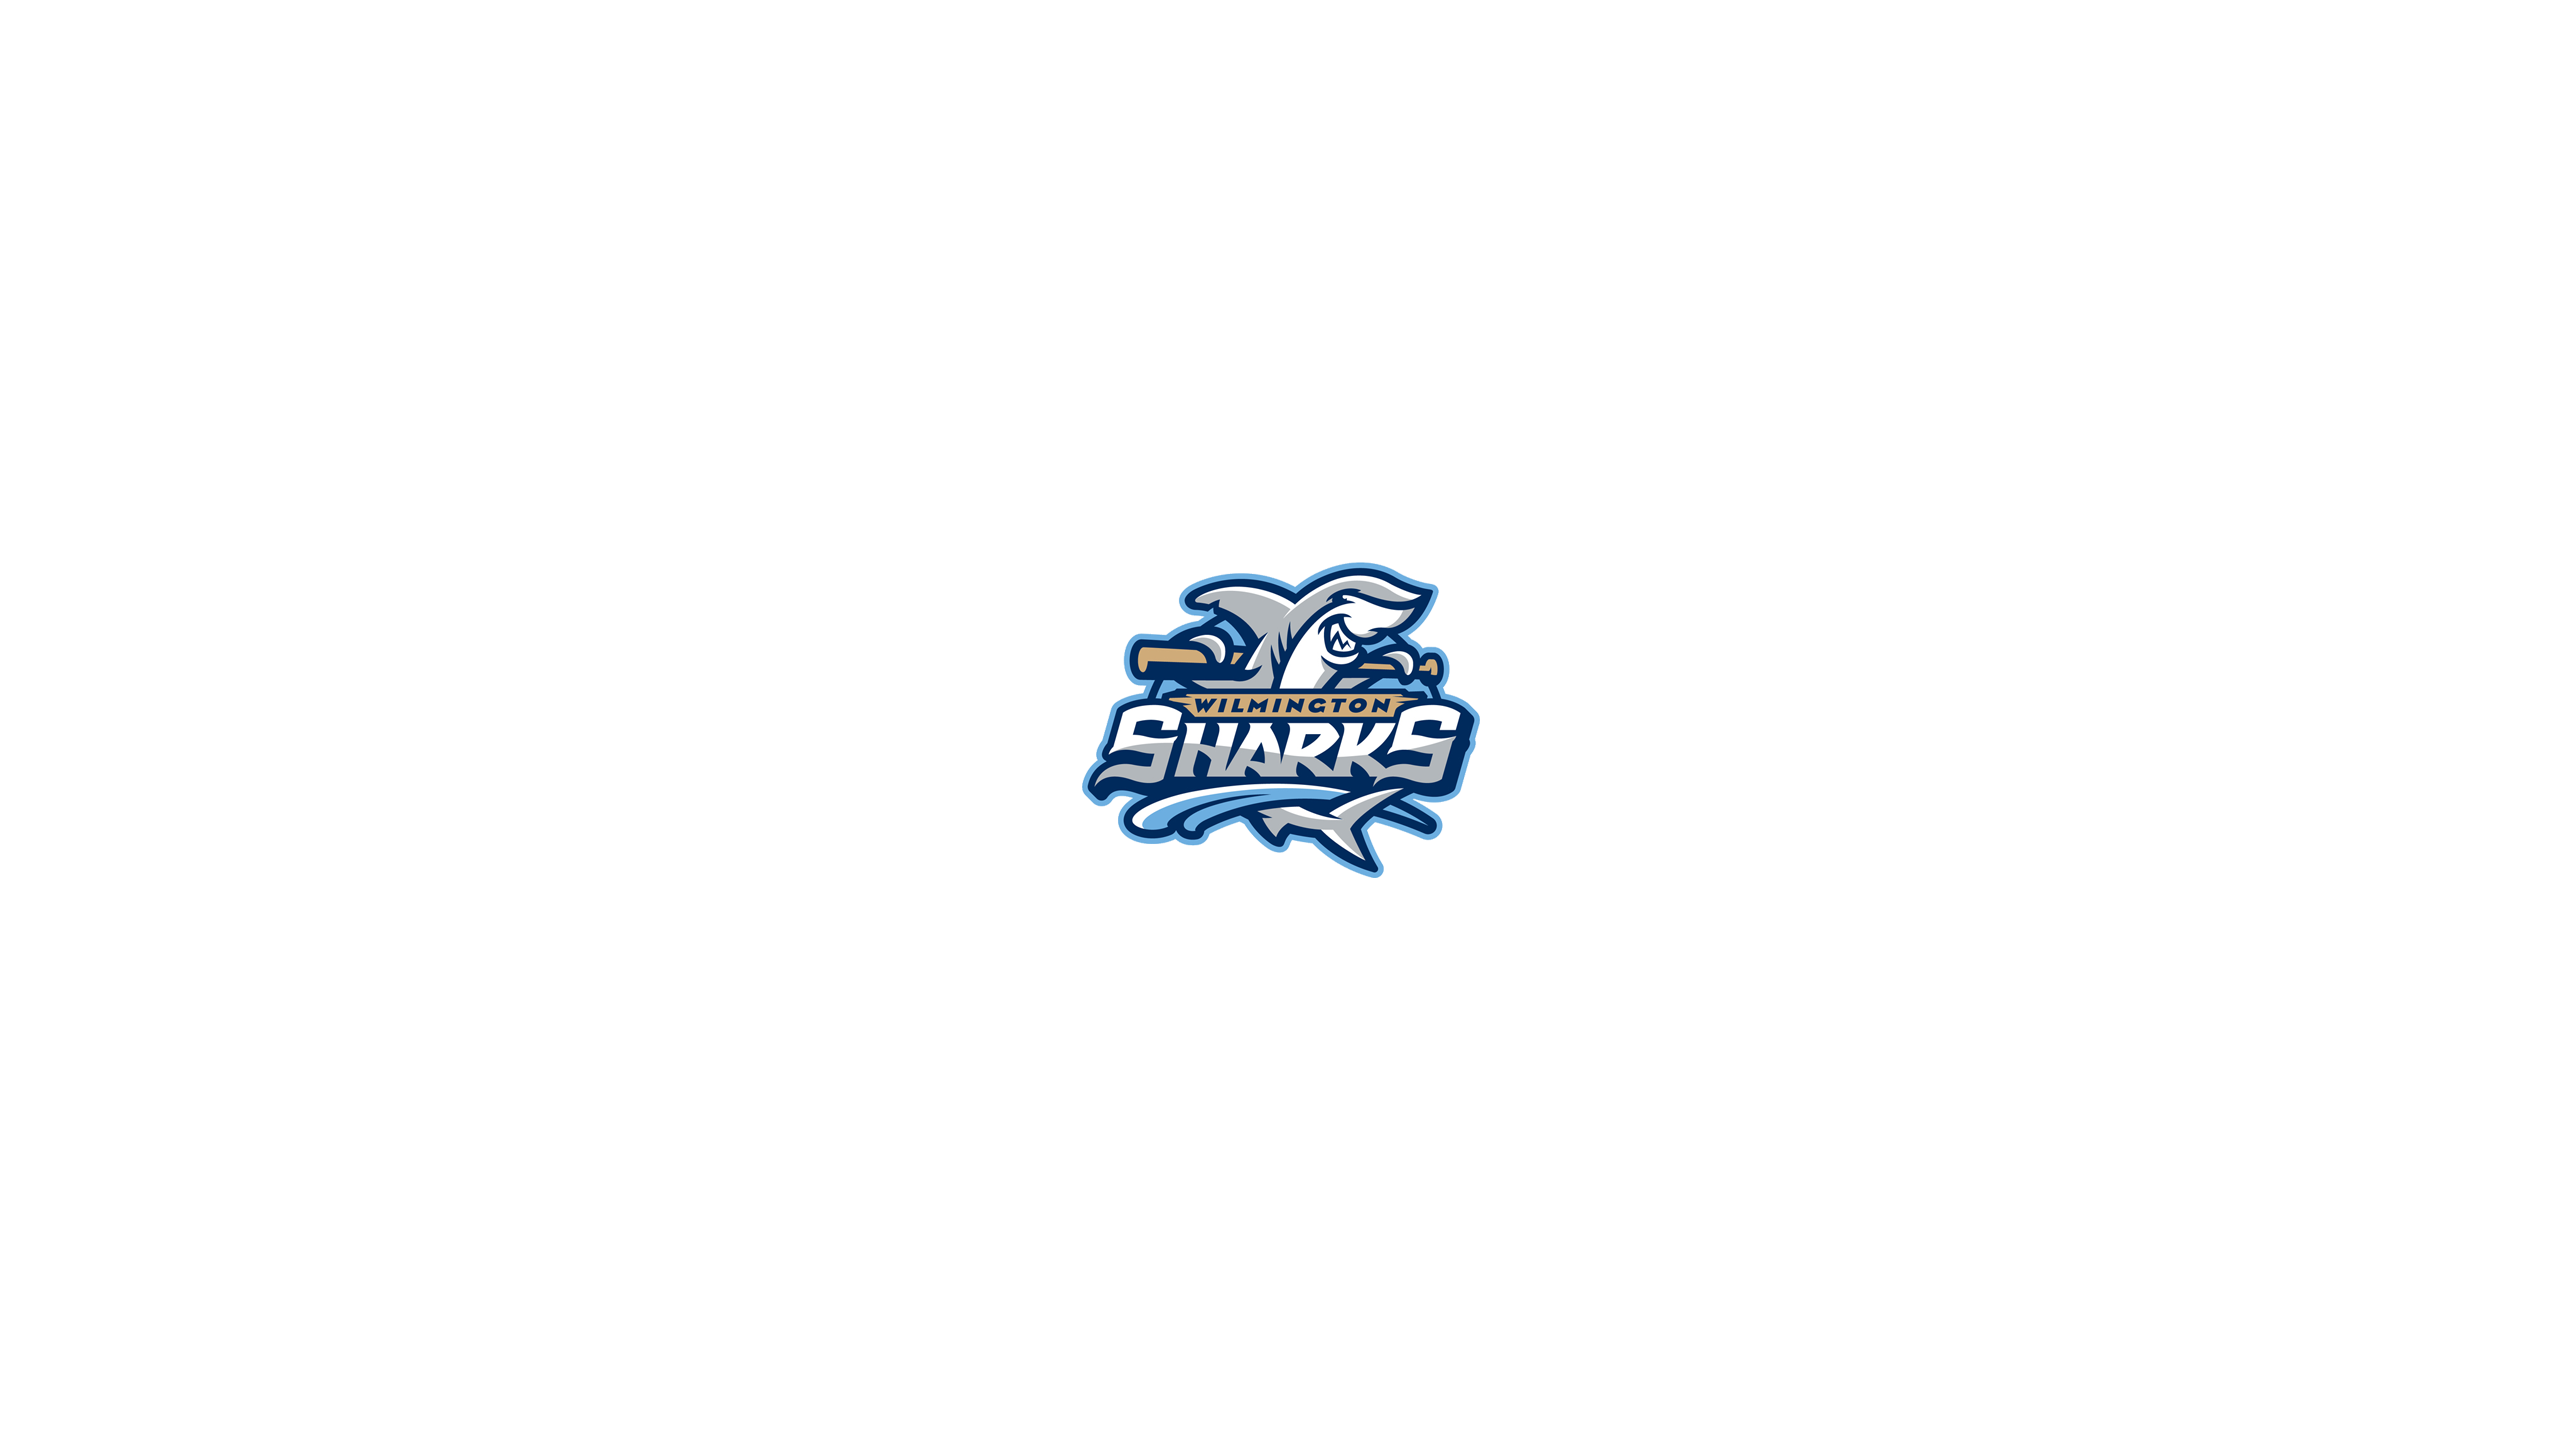 Wilmington (NC) Sharks